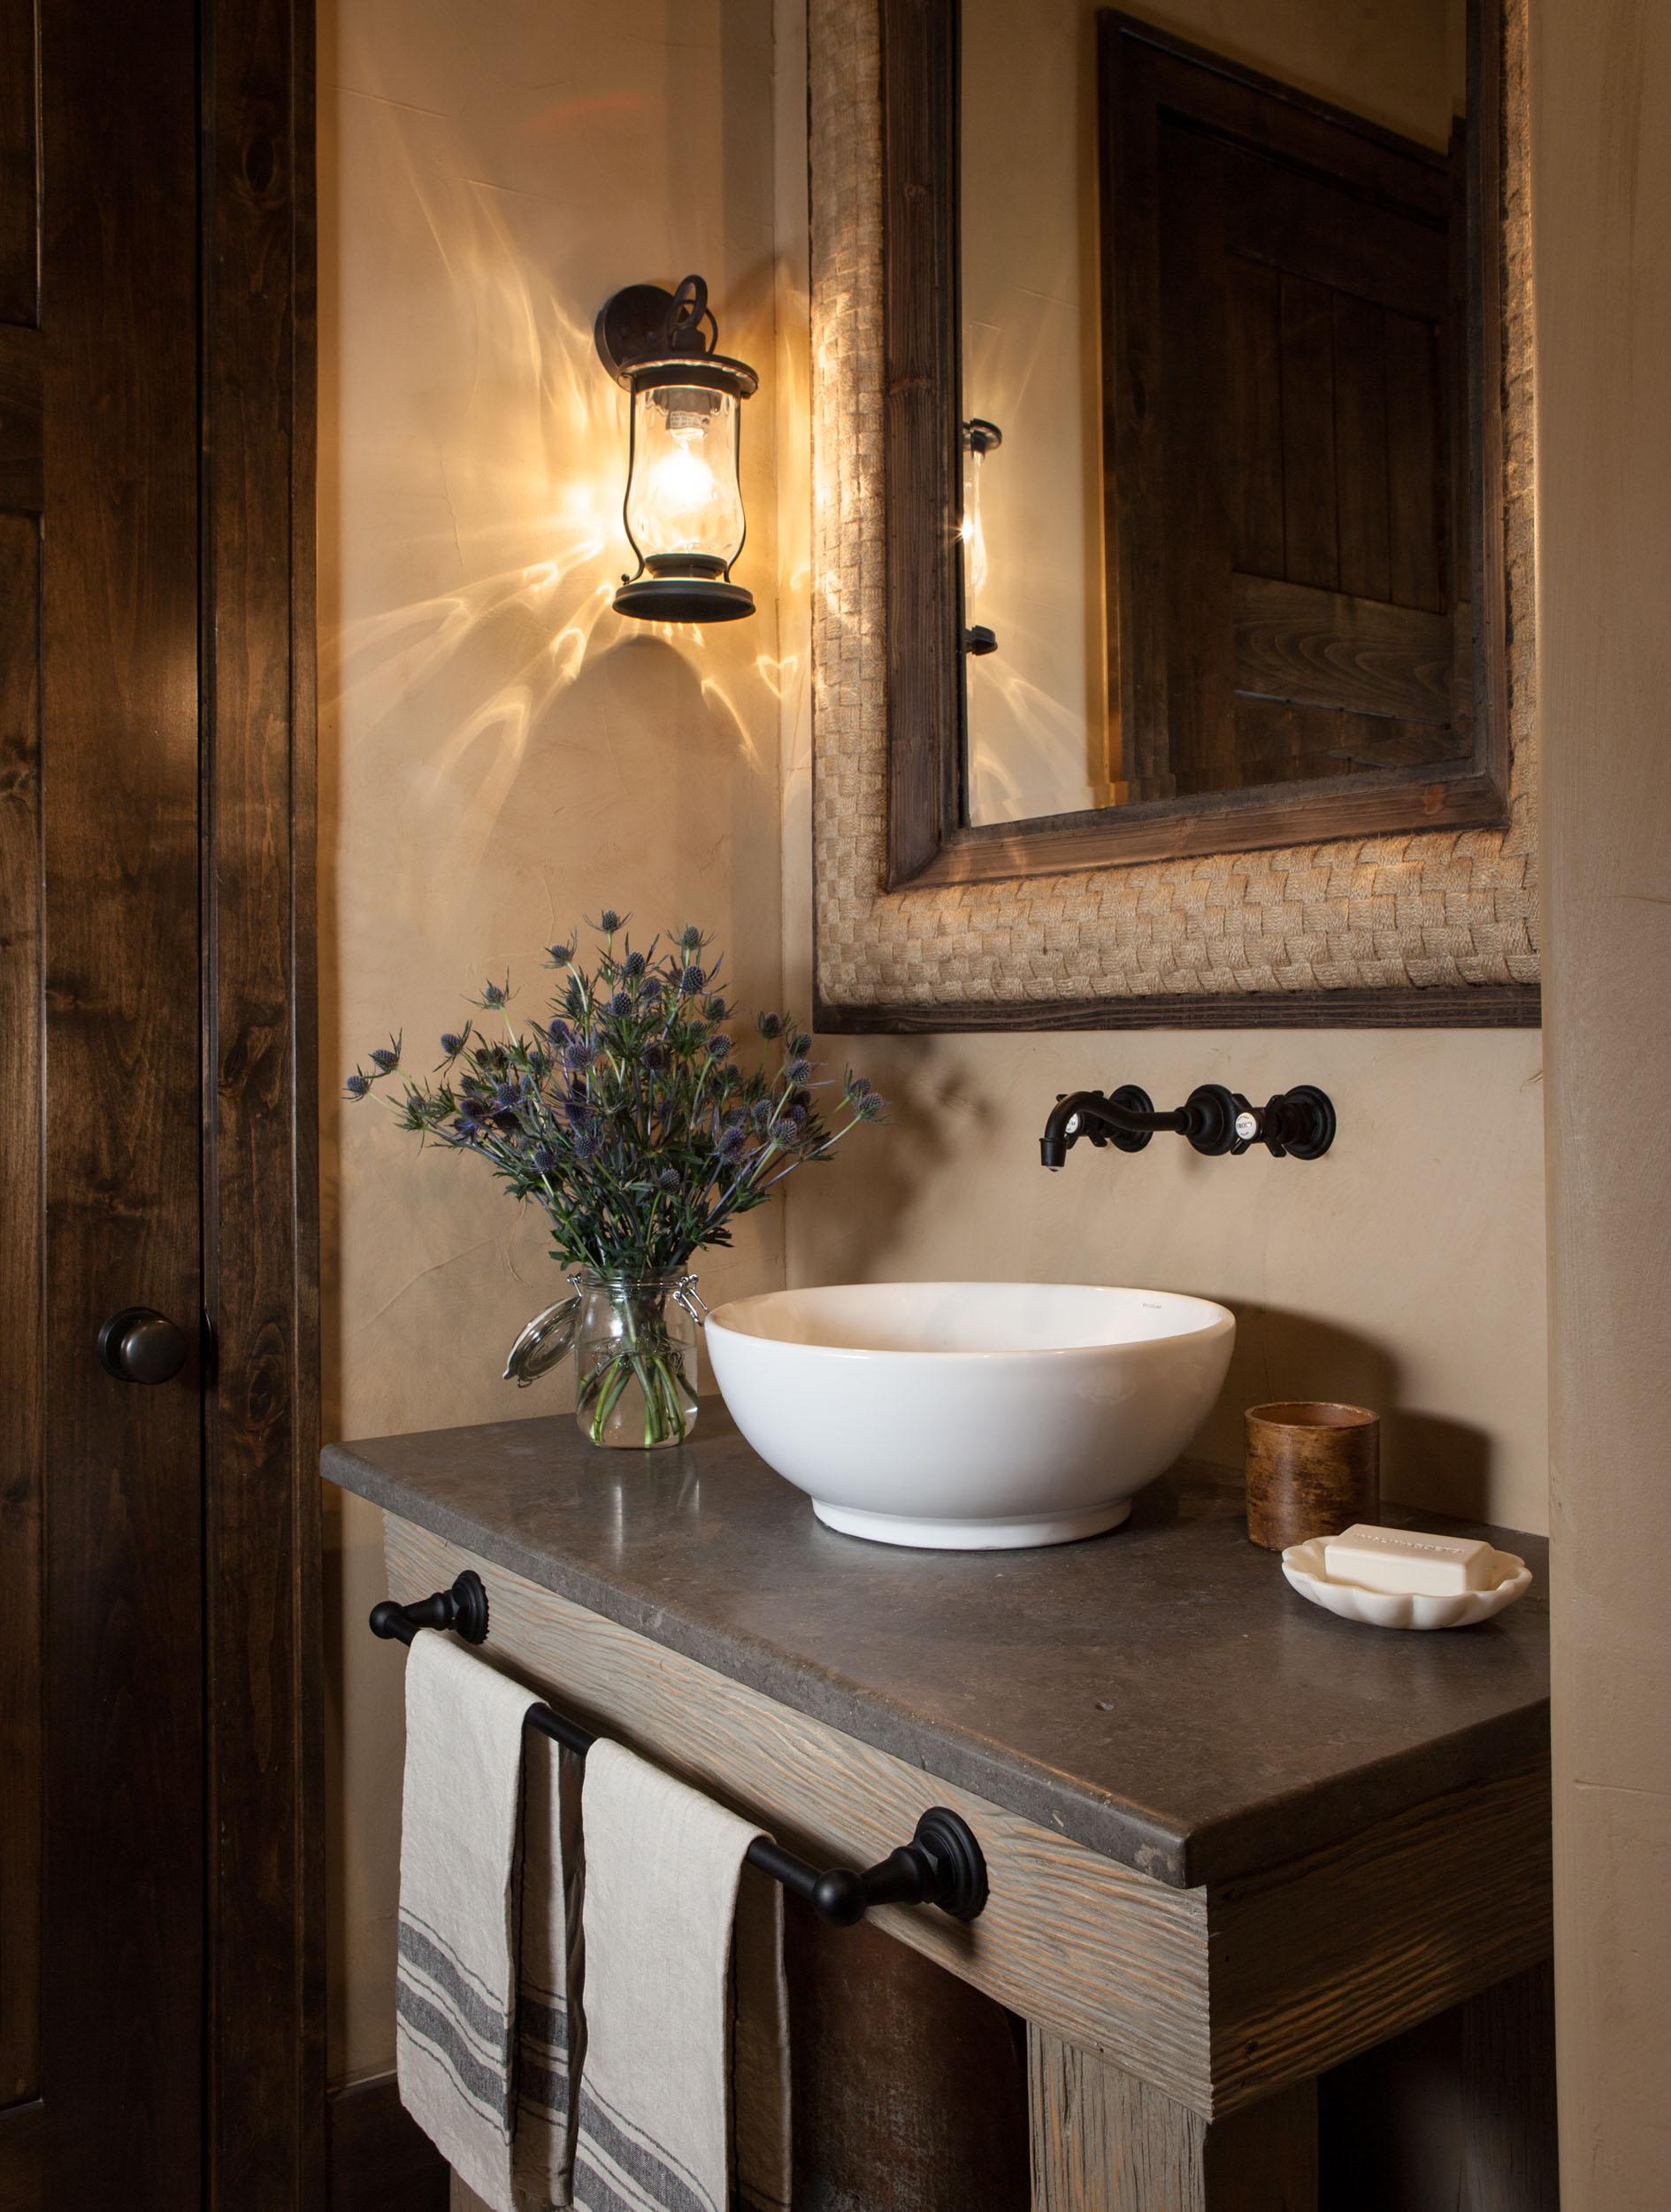 austin-house-bathroom-sink-interior-design.jpg